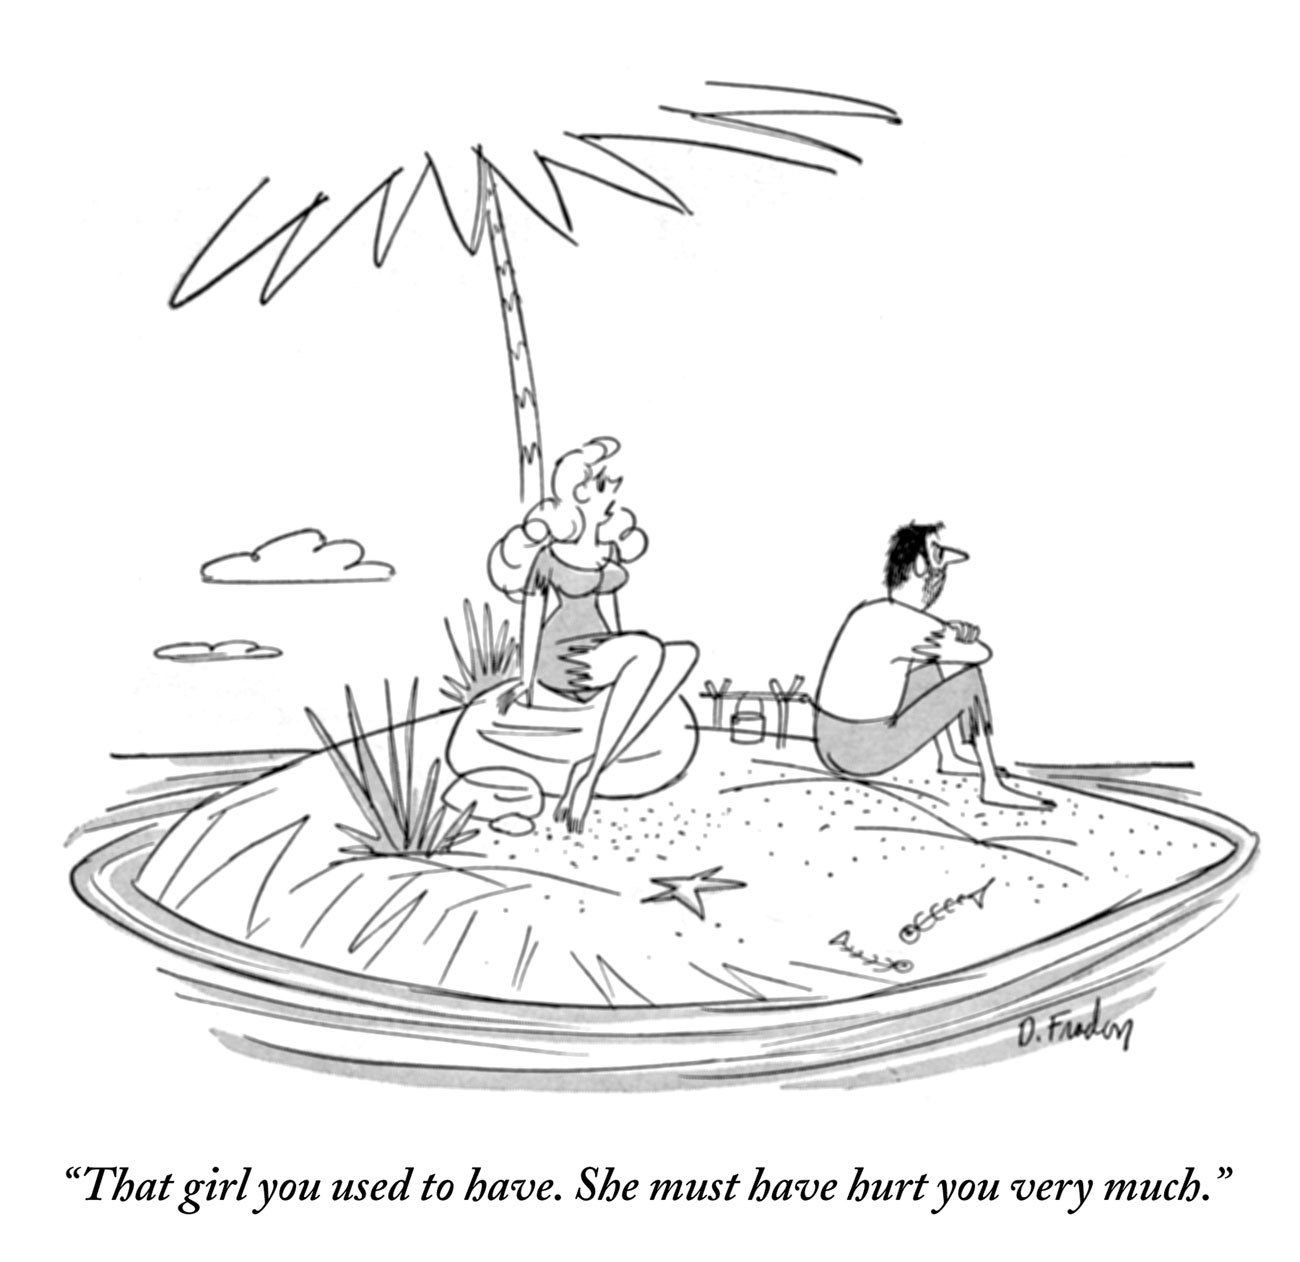 A Guy A Palm Tree And A Desert Island The Cartoon Genre